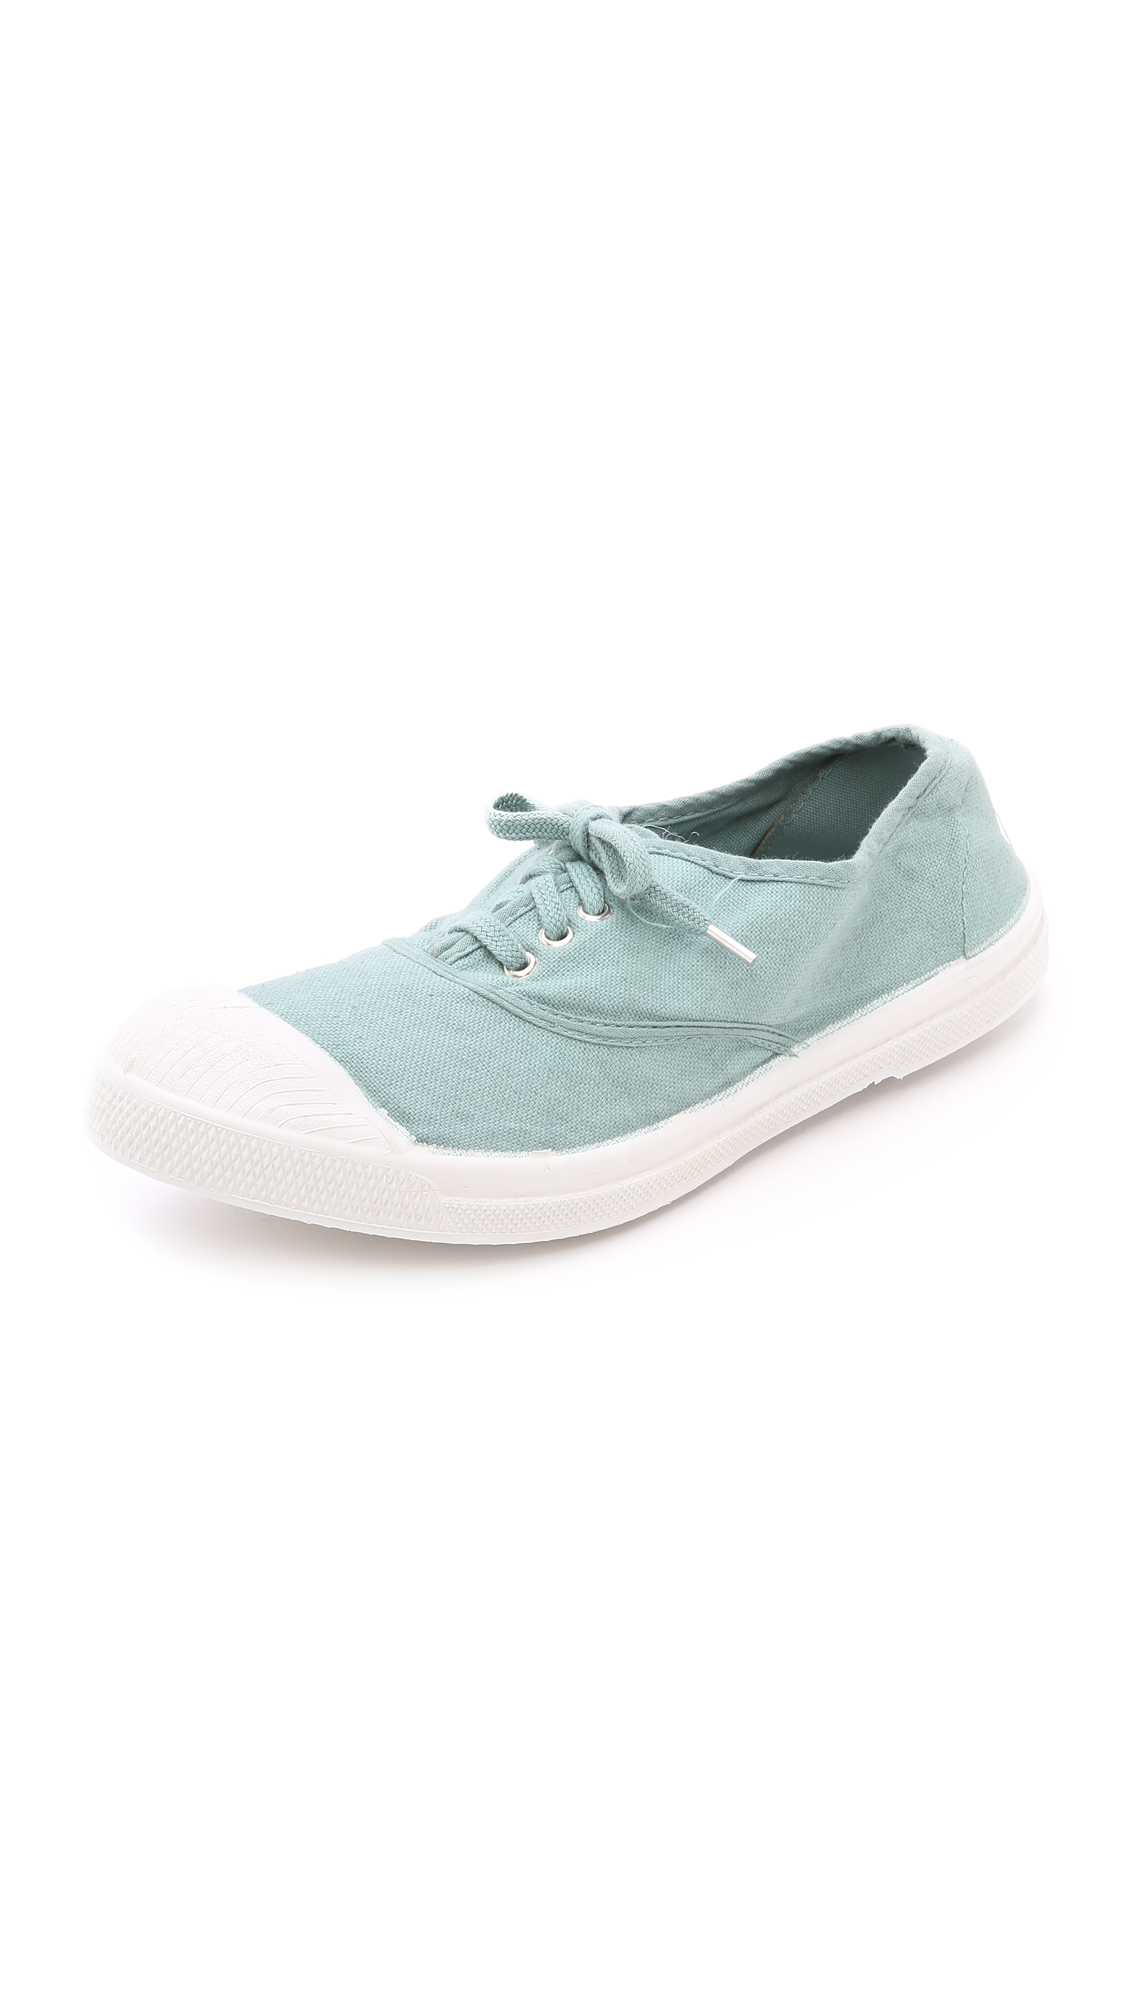 Bensimon Tennis Sneakers Ice In Blue Lyst